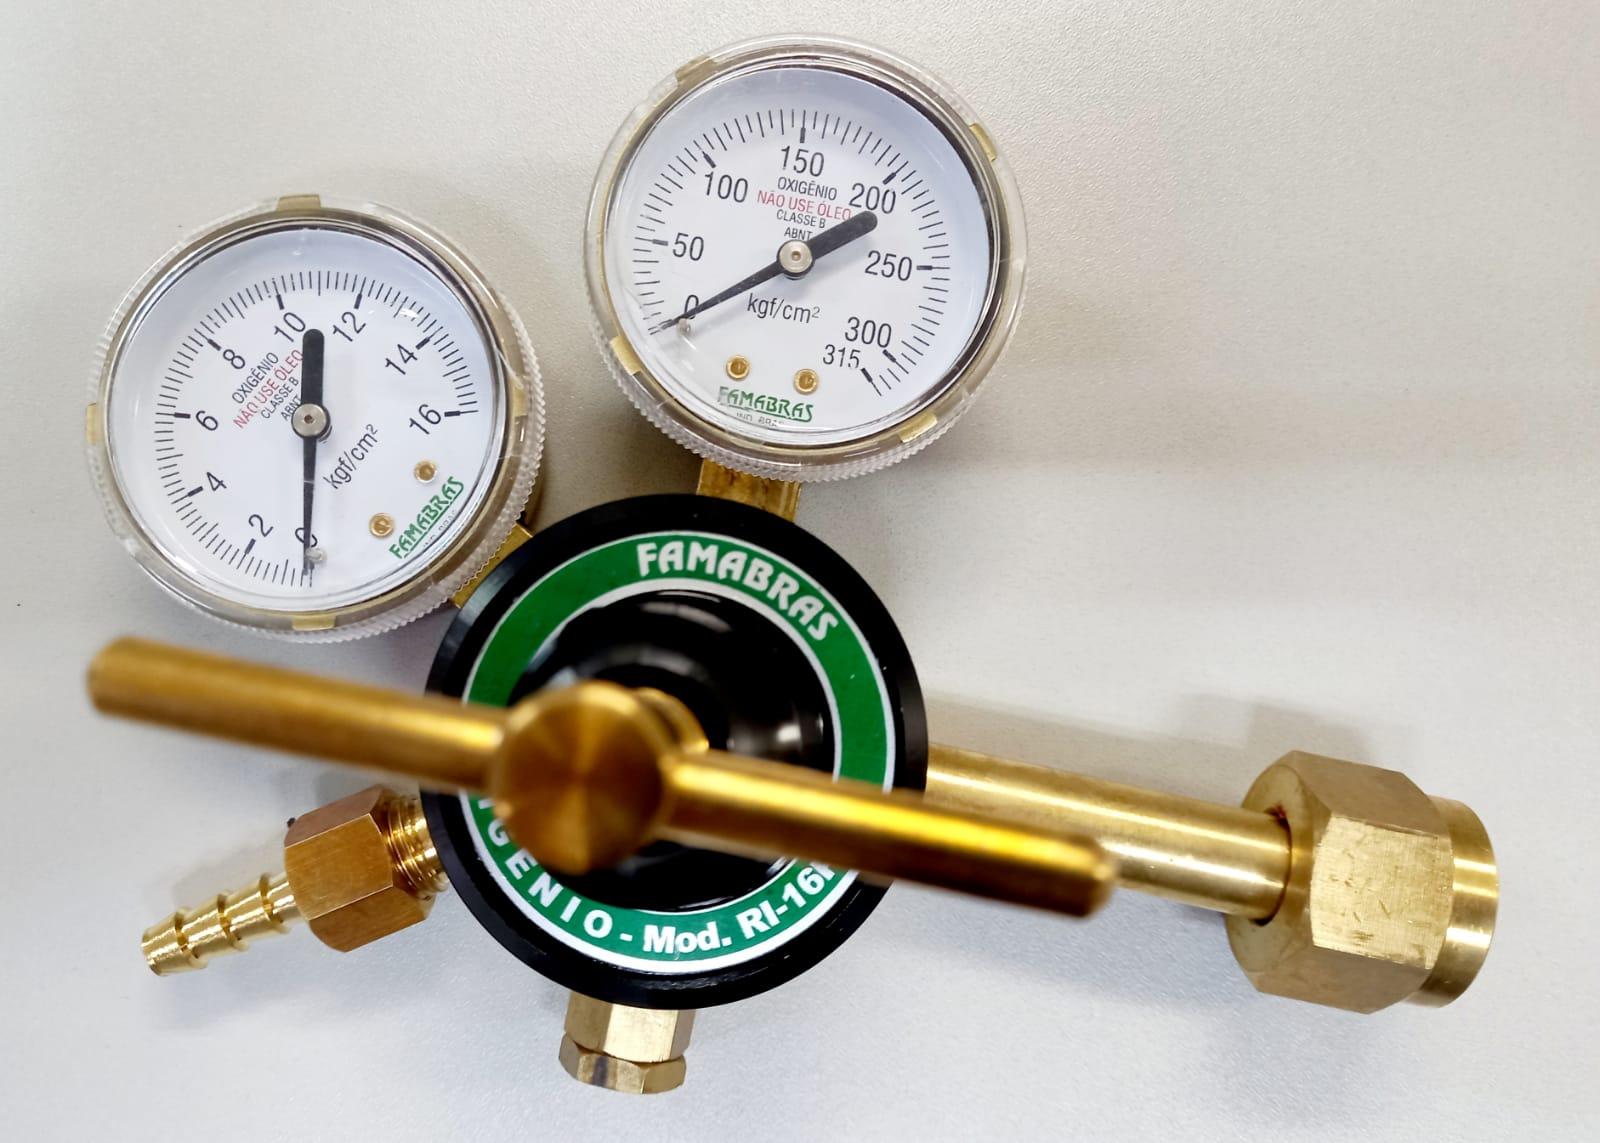 Regulador para Cilindro de Oxigênio Industrial RI 16P - Famabras